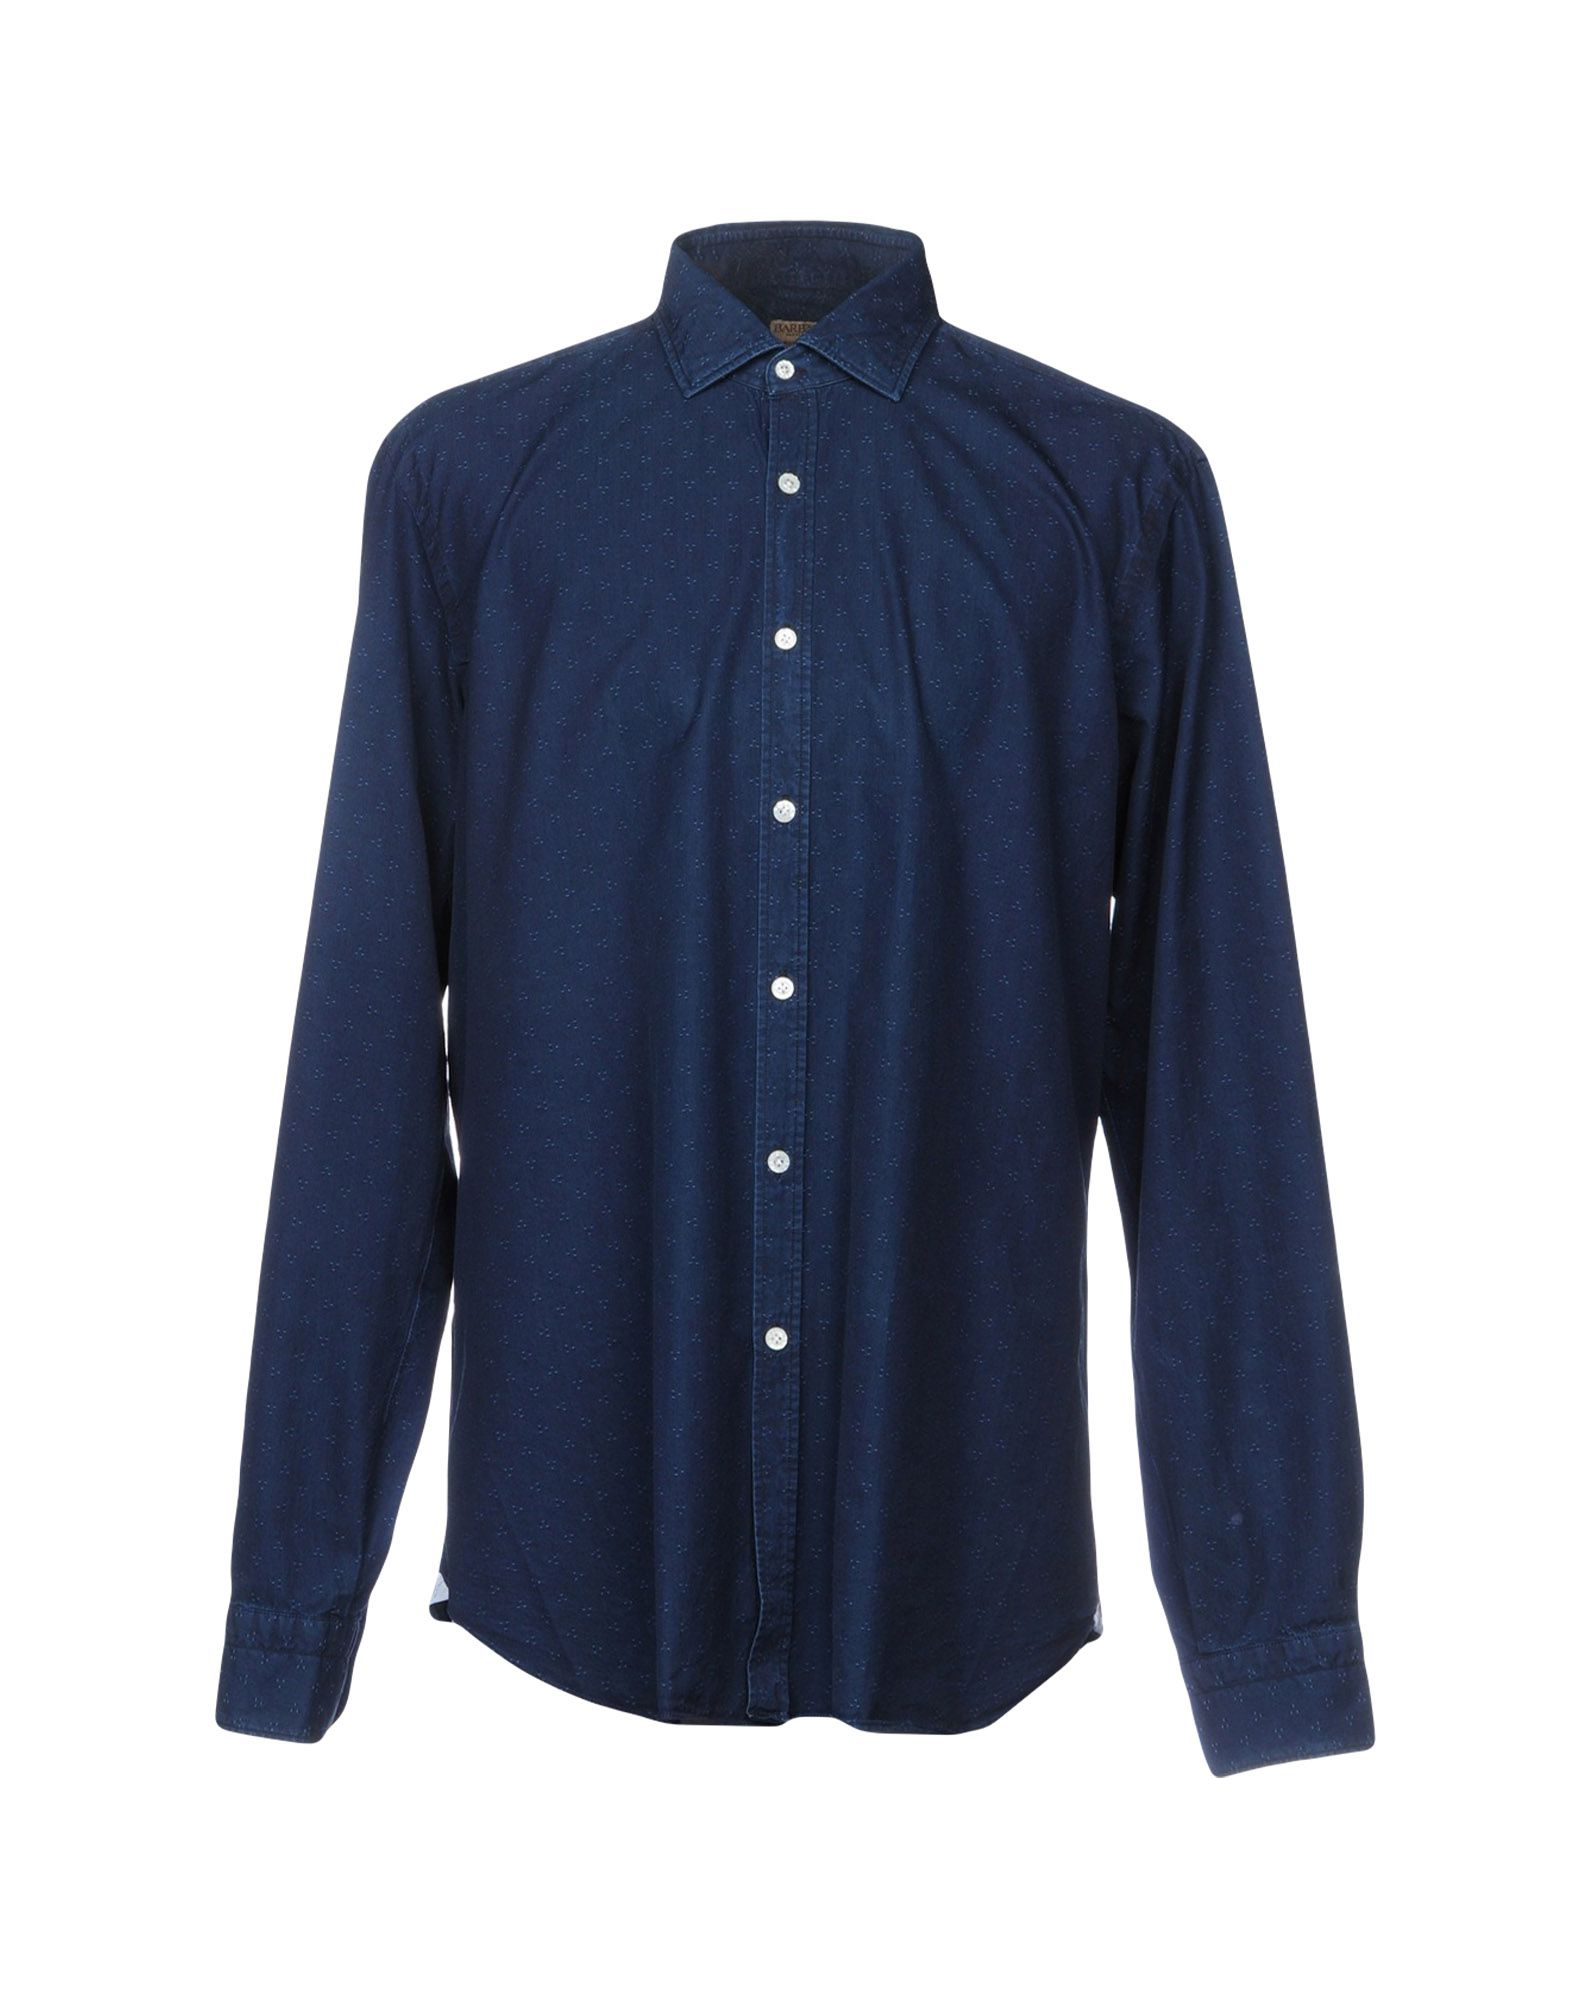 купить BARBA Napoli Джинсовая рубашка по цене 12250 рублей